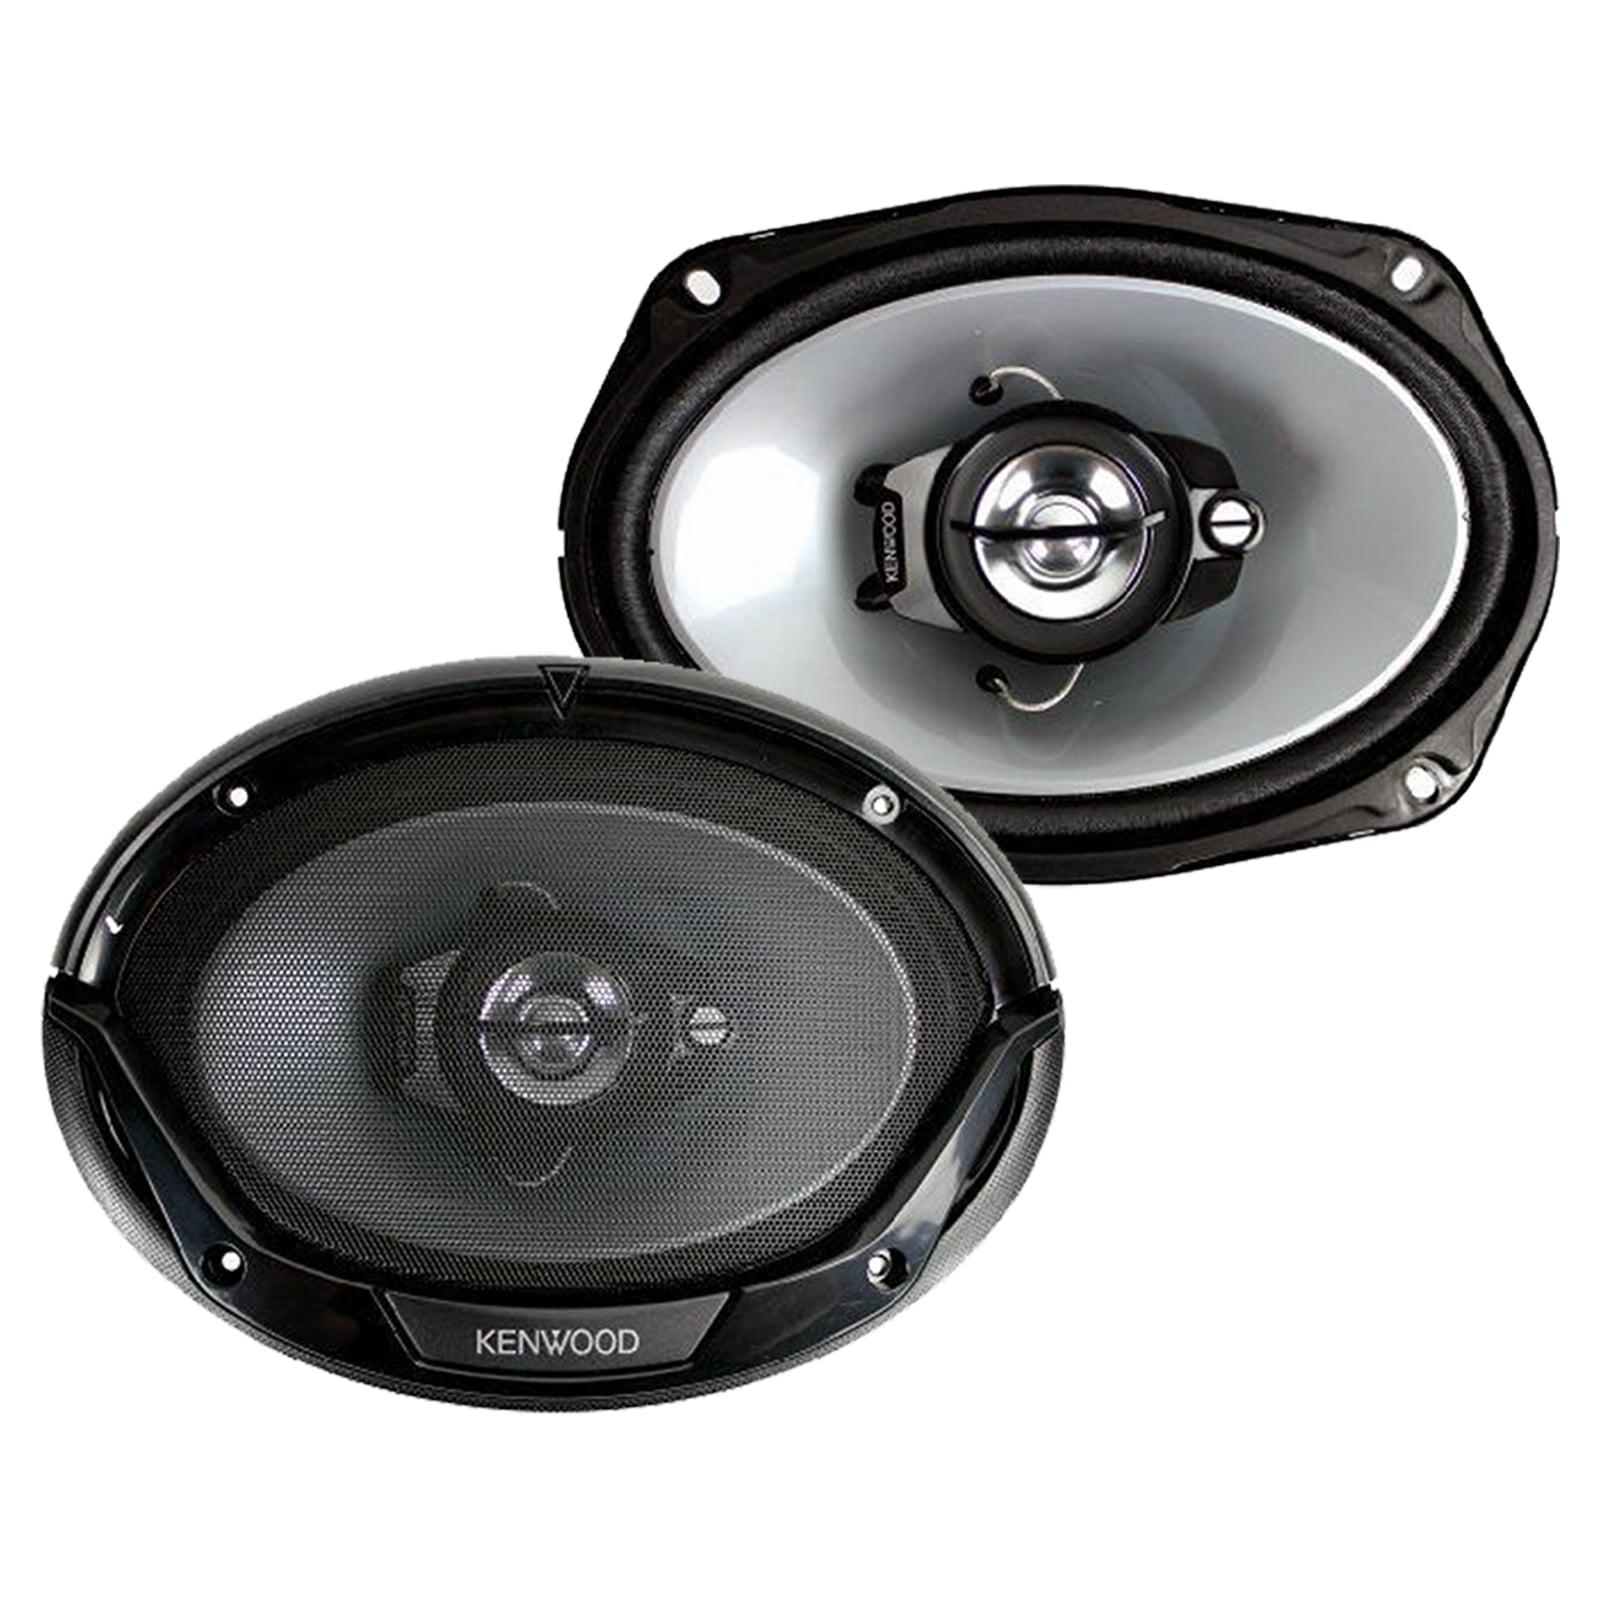 Kenwood KDC168U Car Radio USB AUX CD Player Receiver 2X 6.5-6.75 4-Way Stereo Speaker Bundle with 2X TSA1676R 6.5 3-Way Car Audio Speakers Amp Kit 4-Channel Amplifier